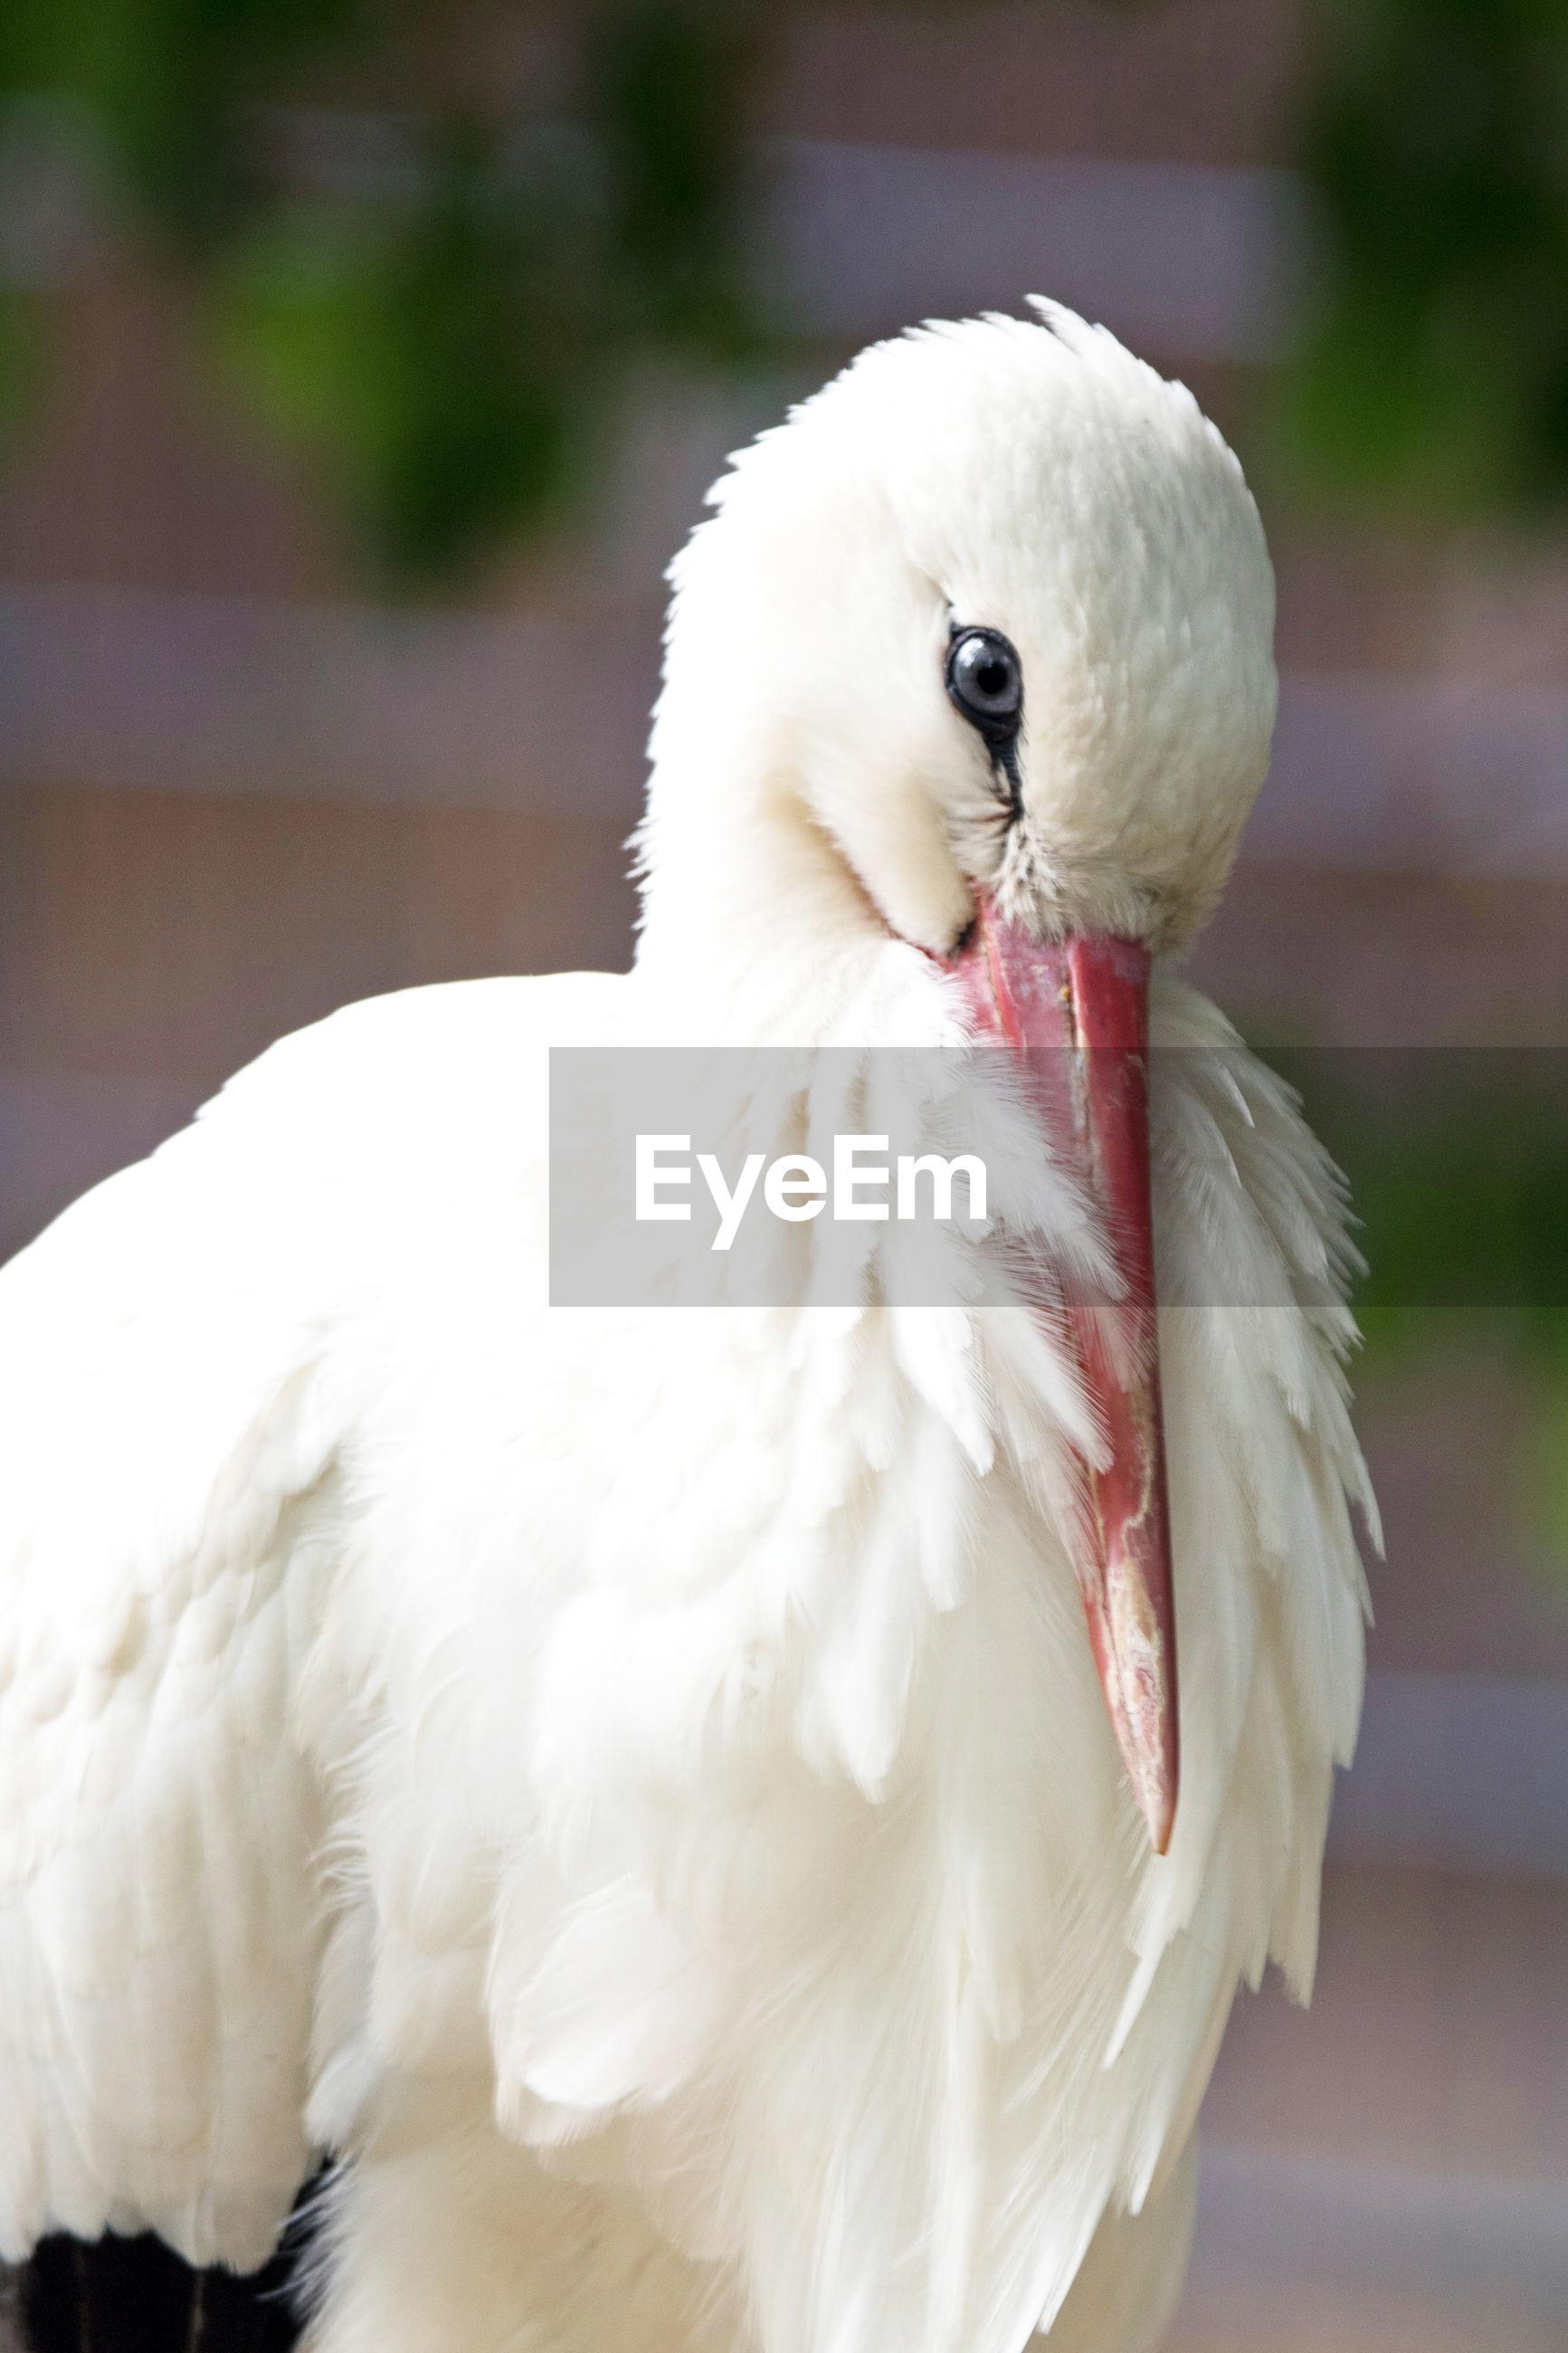 CLOSE-UP OF A WHITE BIRD